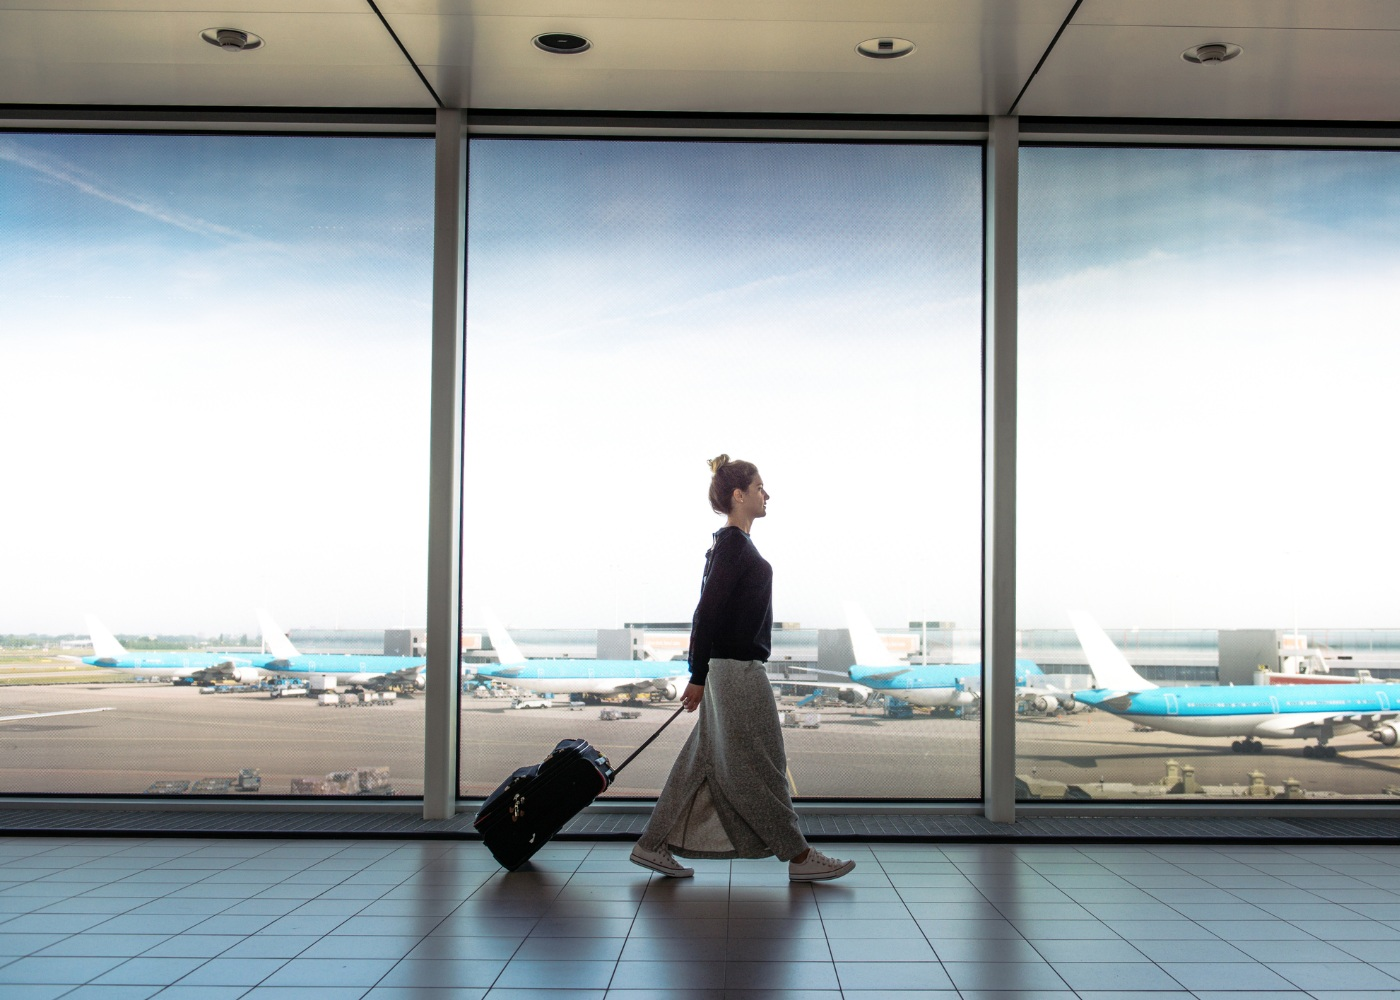 Mulher em aeroporto